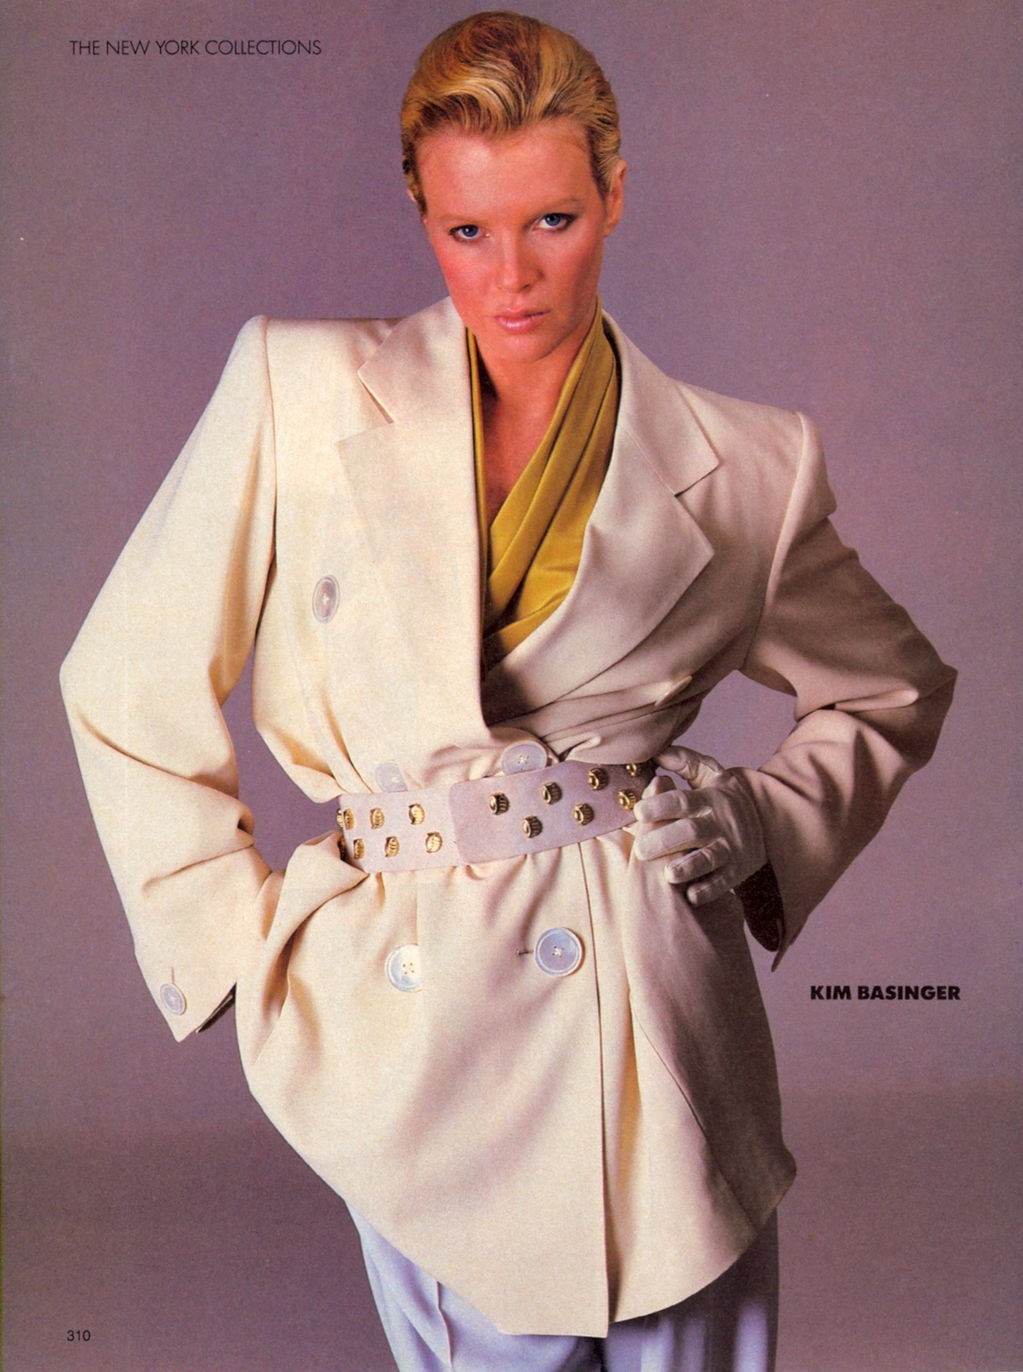 Kim Basinger Vogue 1985